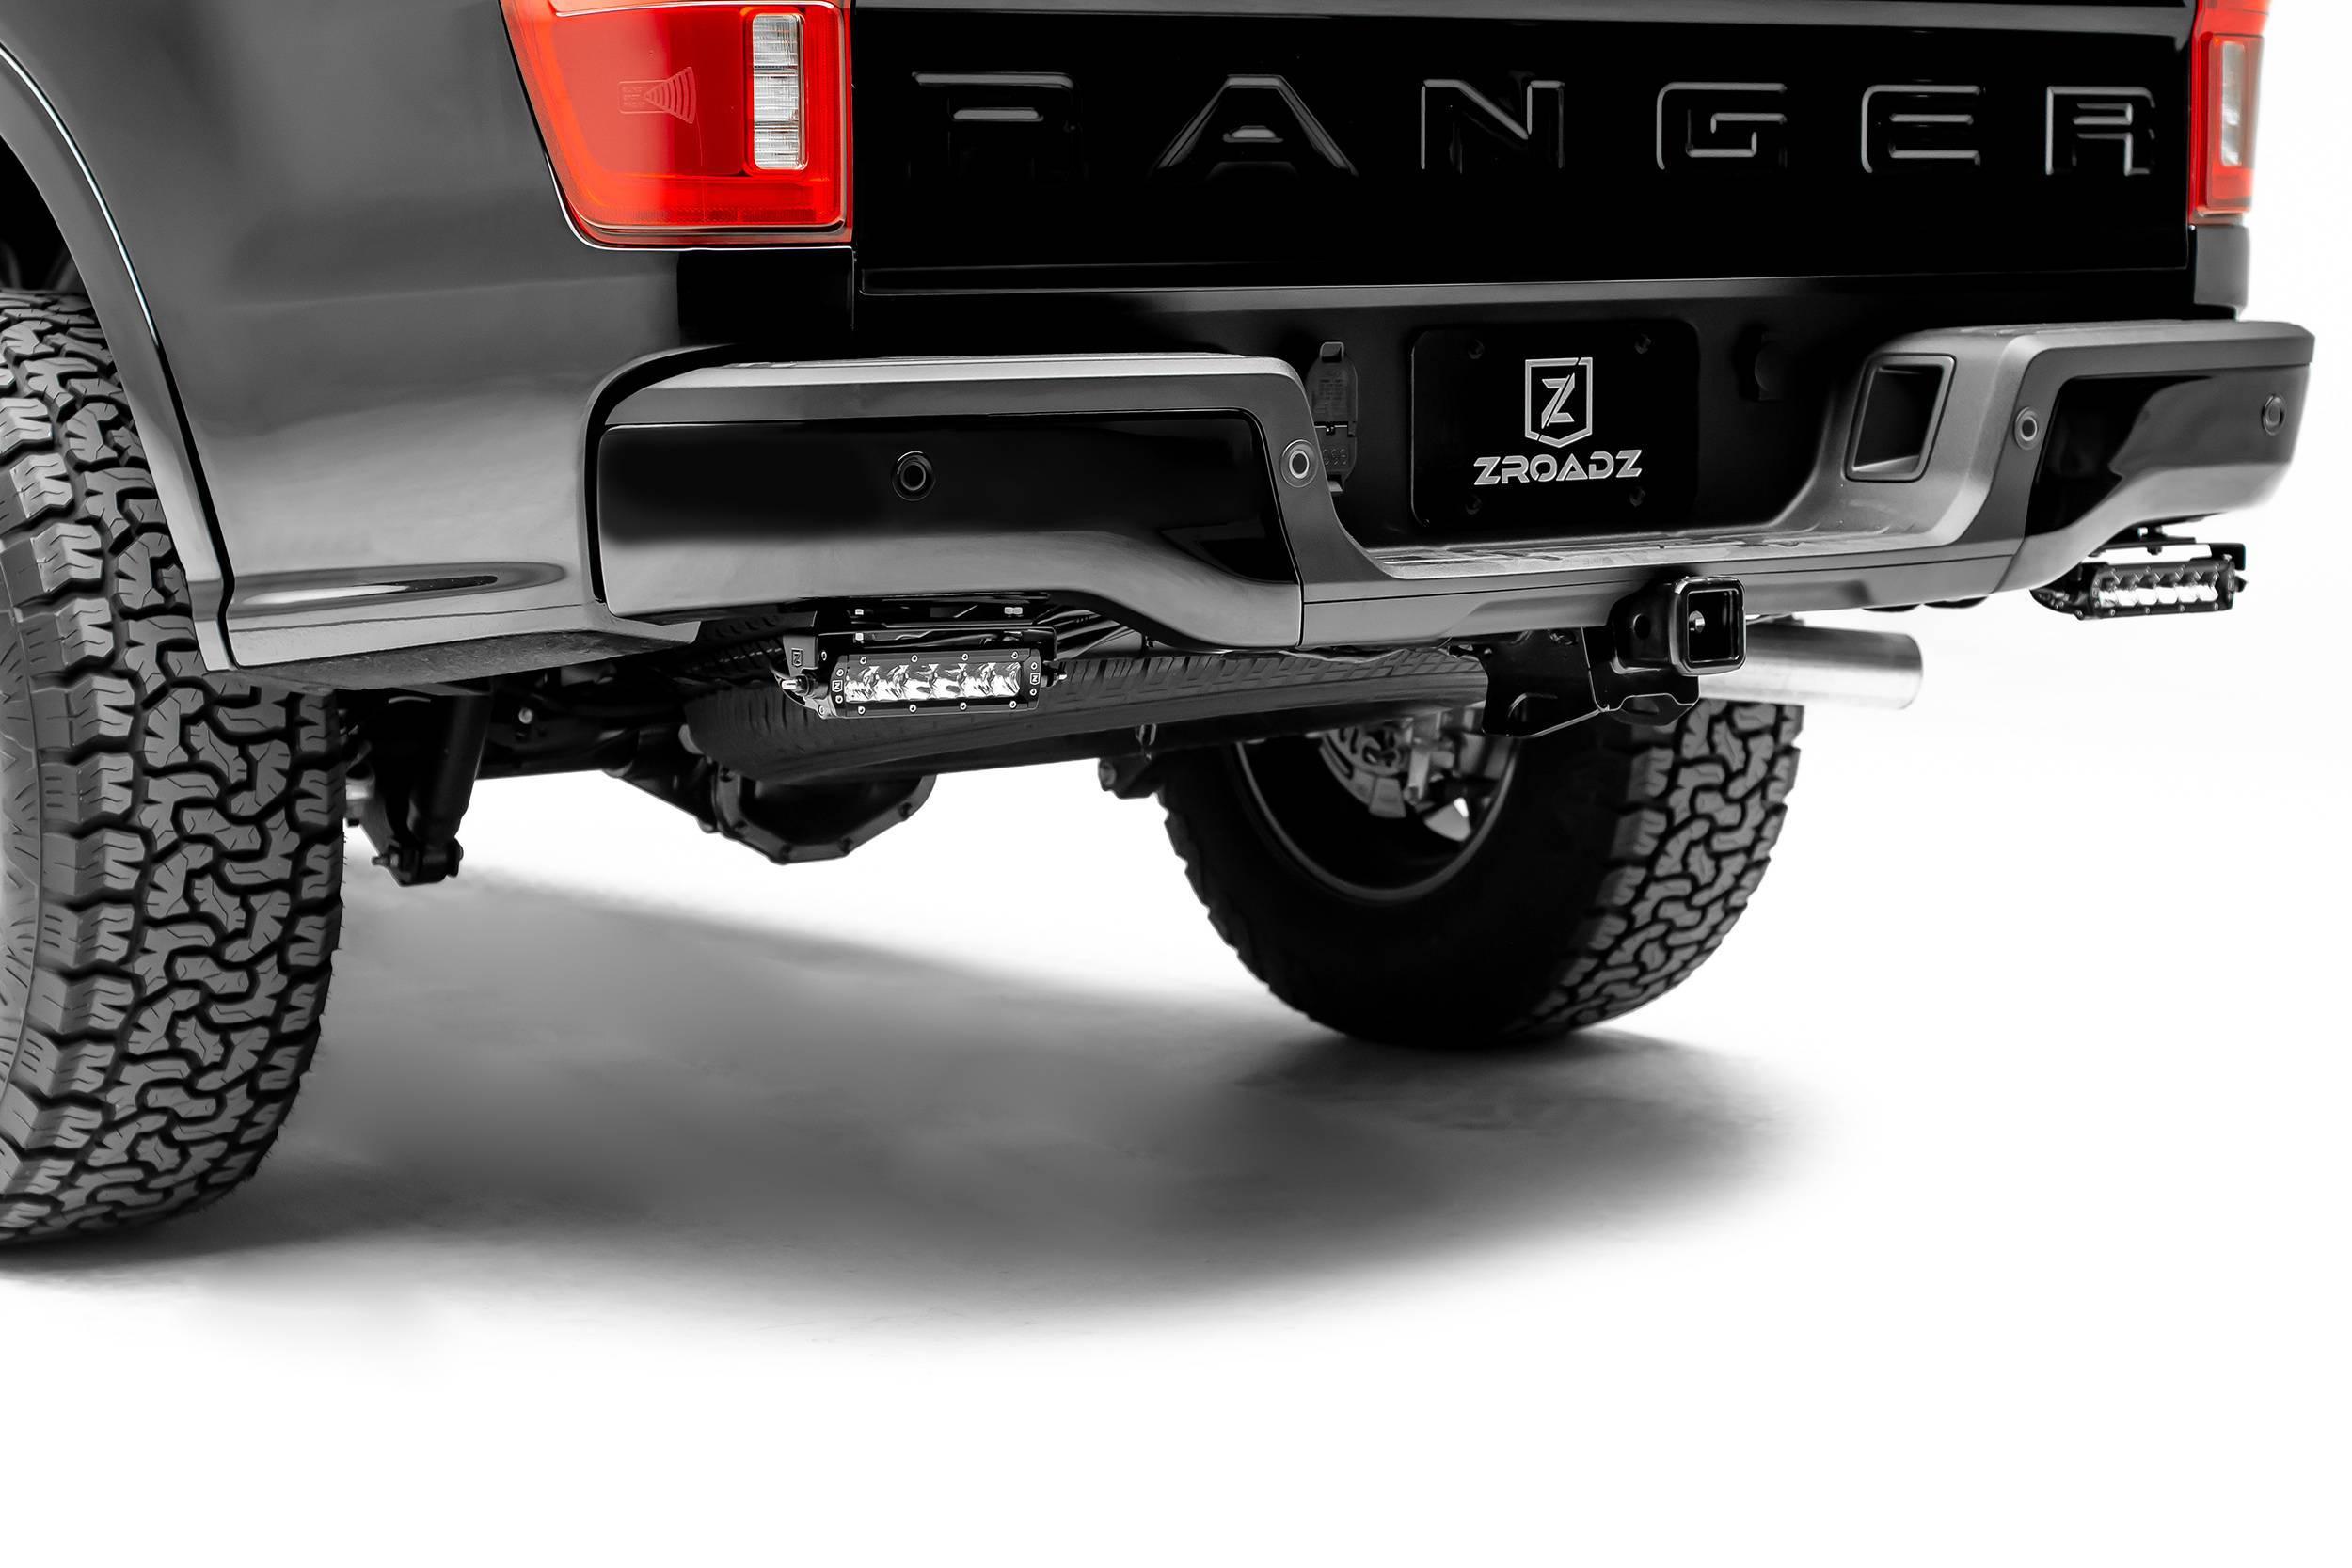 ZROADZ - 2019-2021 Ford Ranger Rear Bumper LED Bracket to mount (2) 6 Inch Straight Single Row Slim Light Bar - PN #Z385881